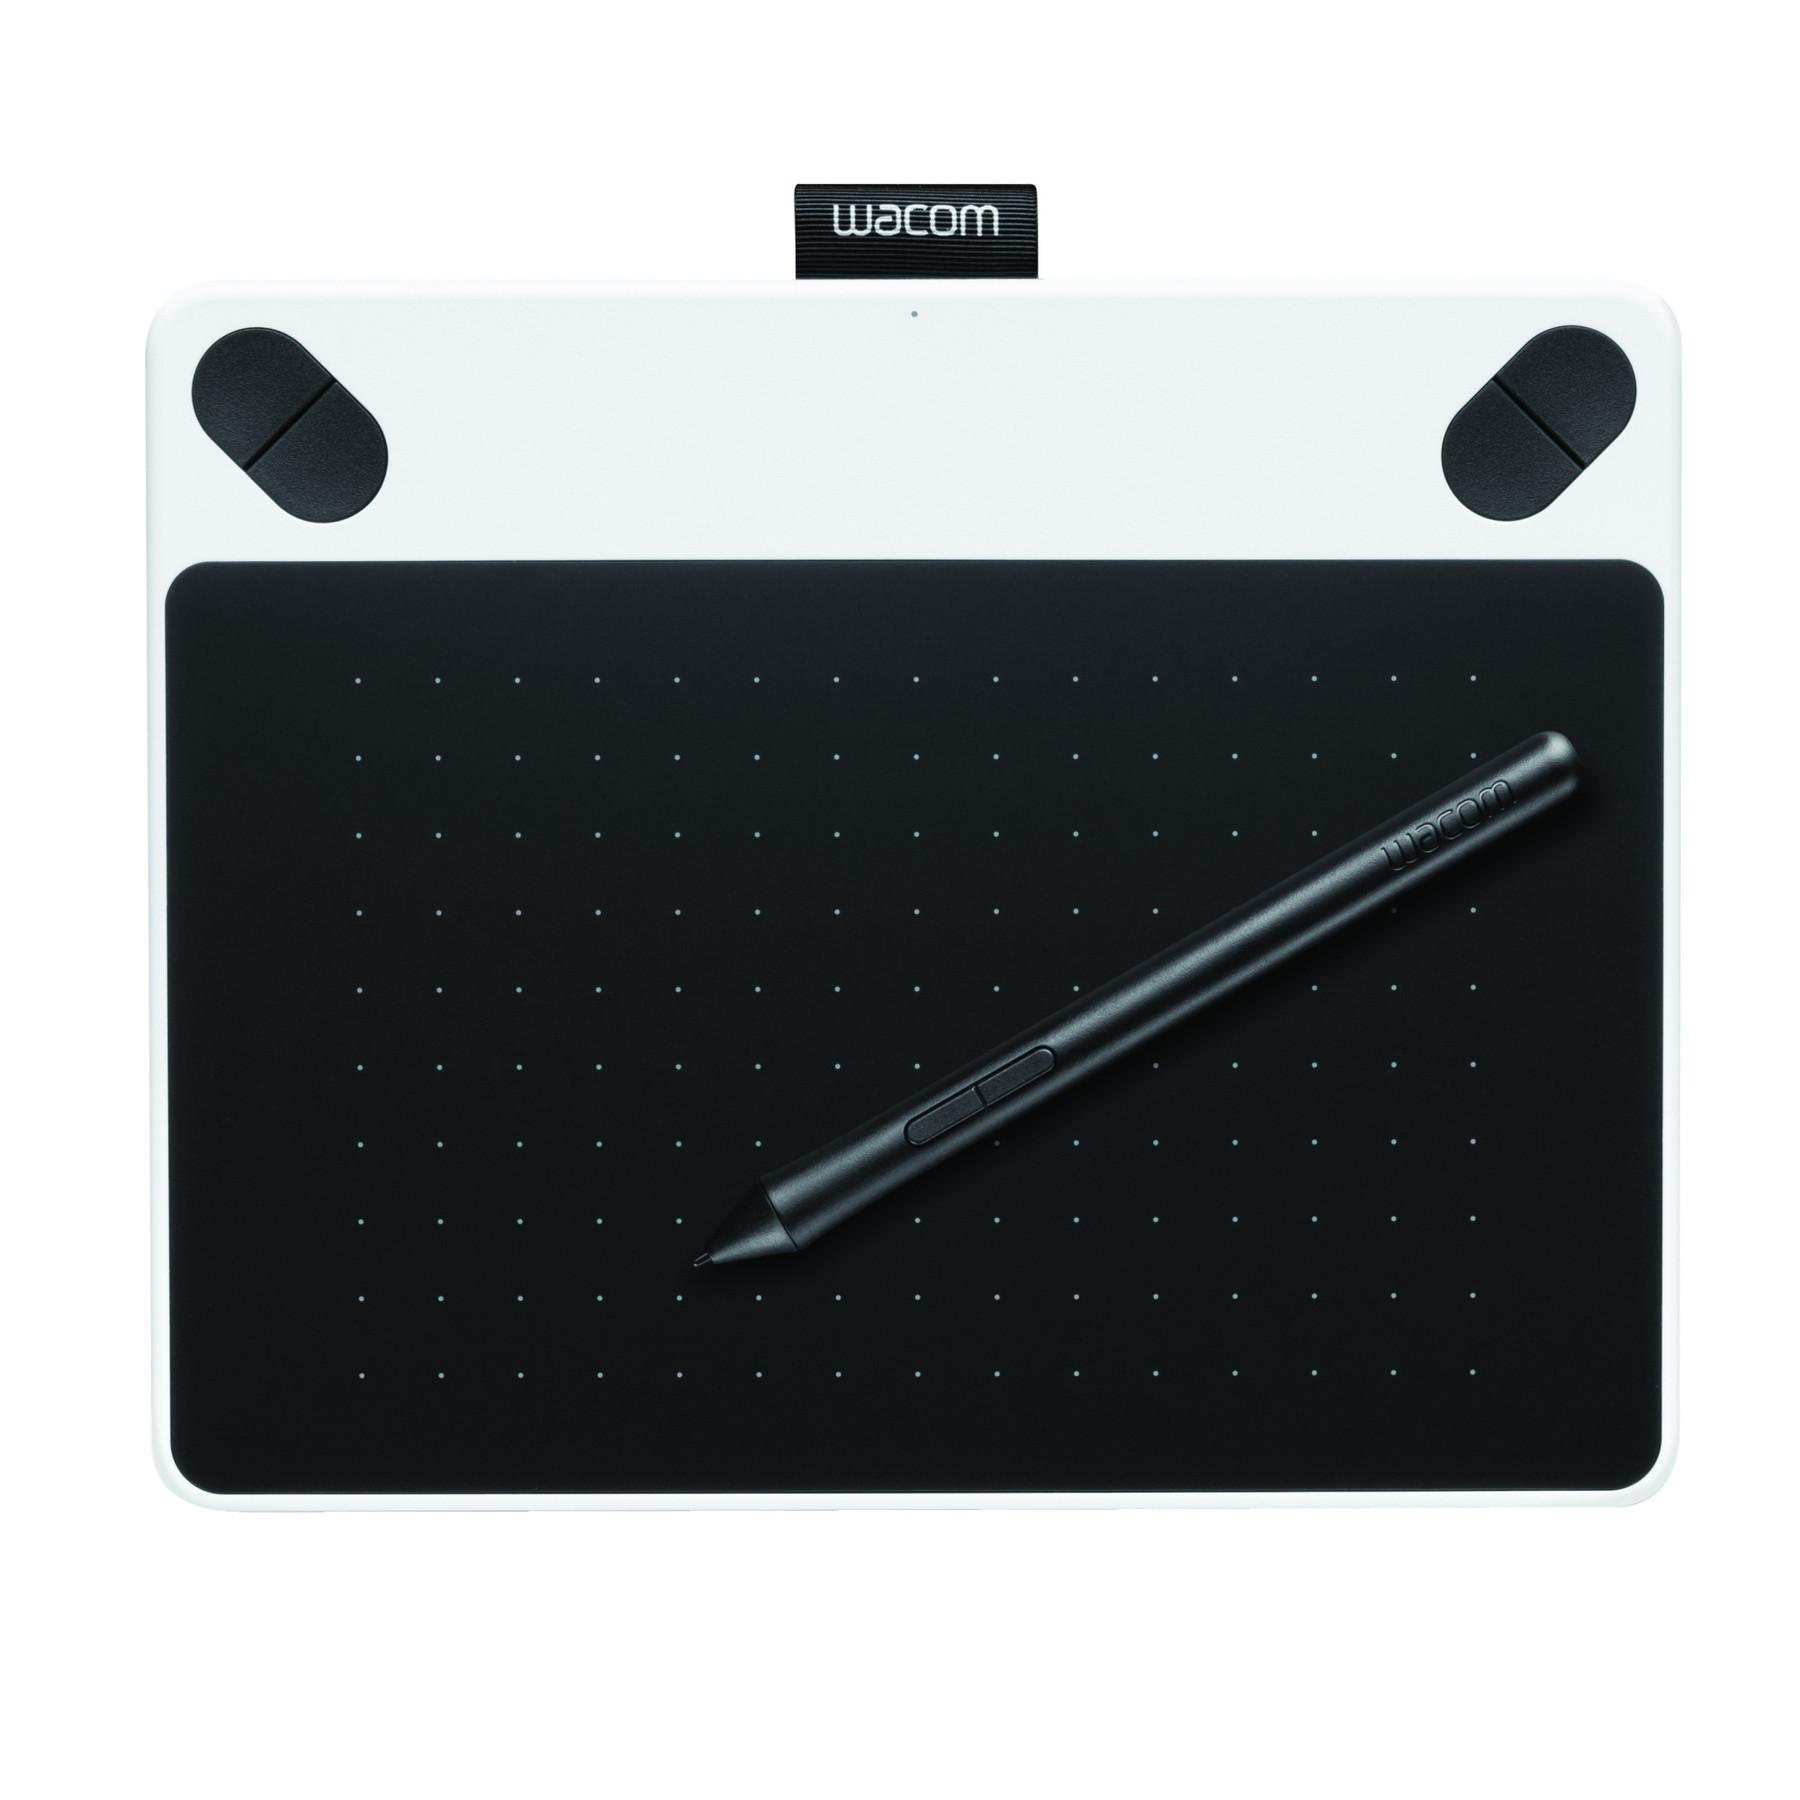 wacom tablet how to draw